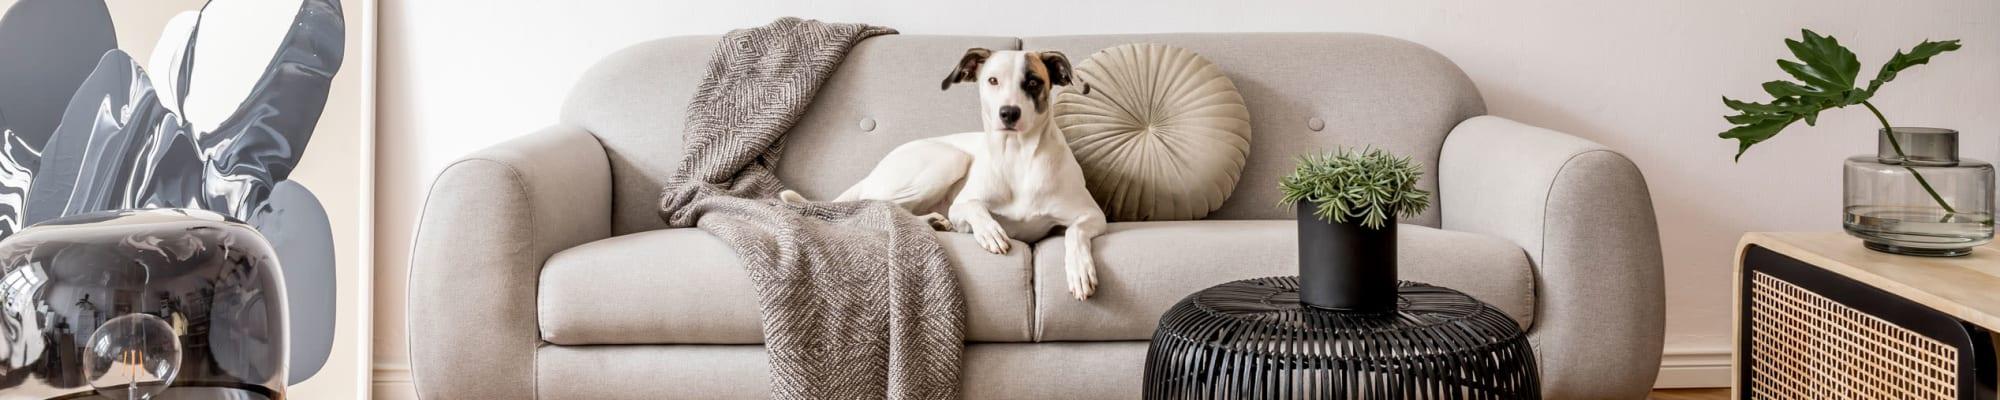 Arthaus Apartments's pet policy in Allston, Massachusetts